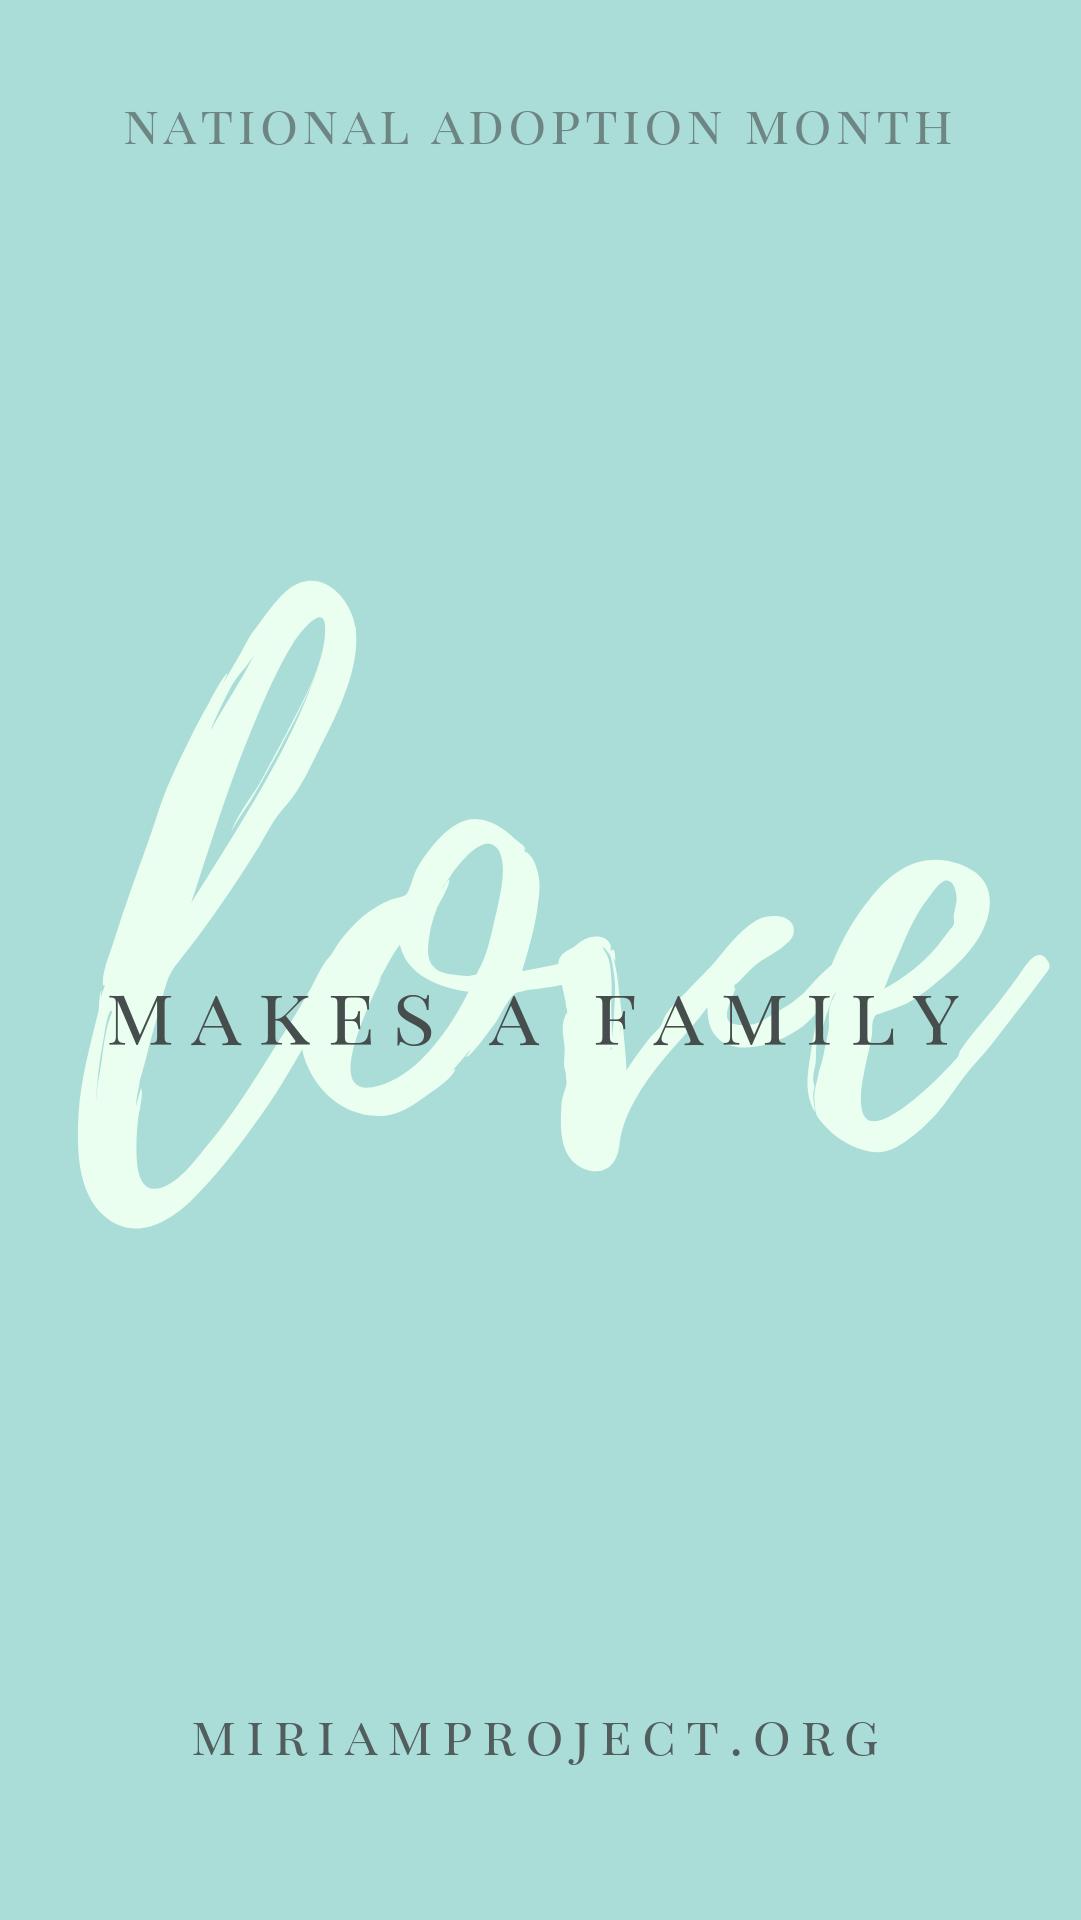 Phone Wallpaper Nationaladoptionmonth Adoption Wallpaper National Adoption Month Adoption Make A Family